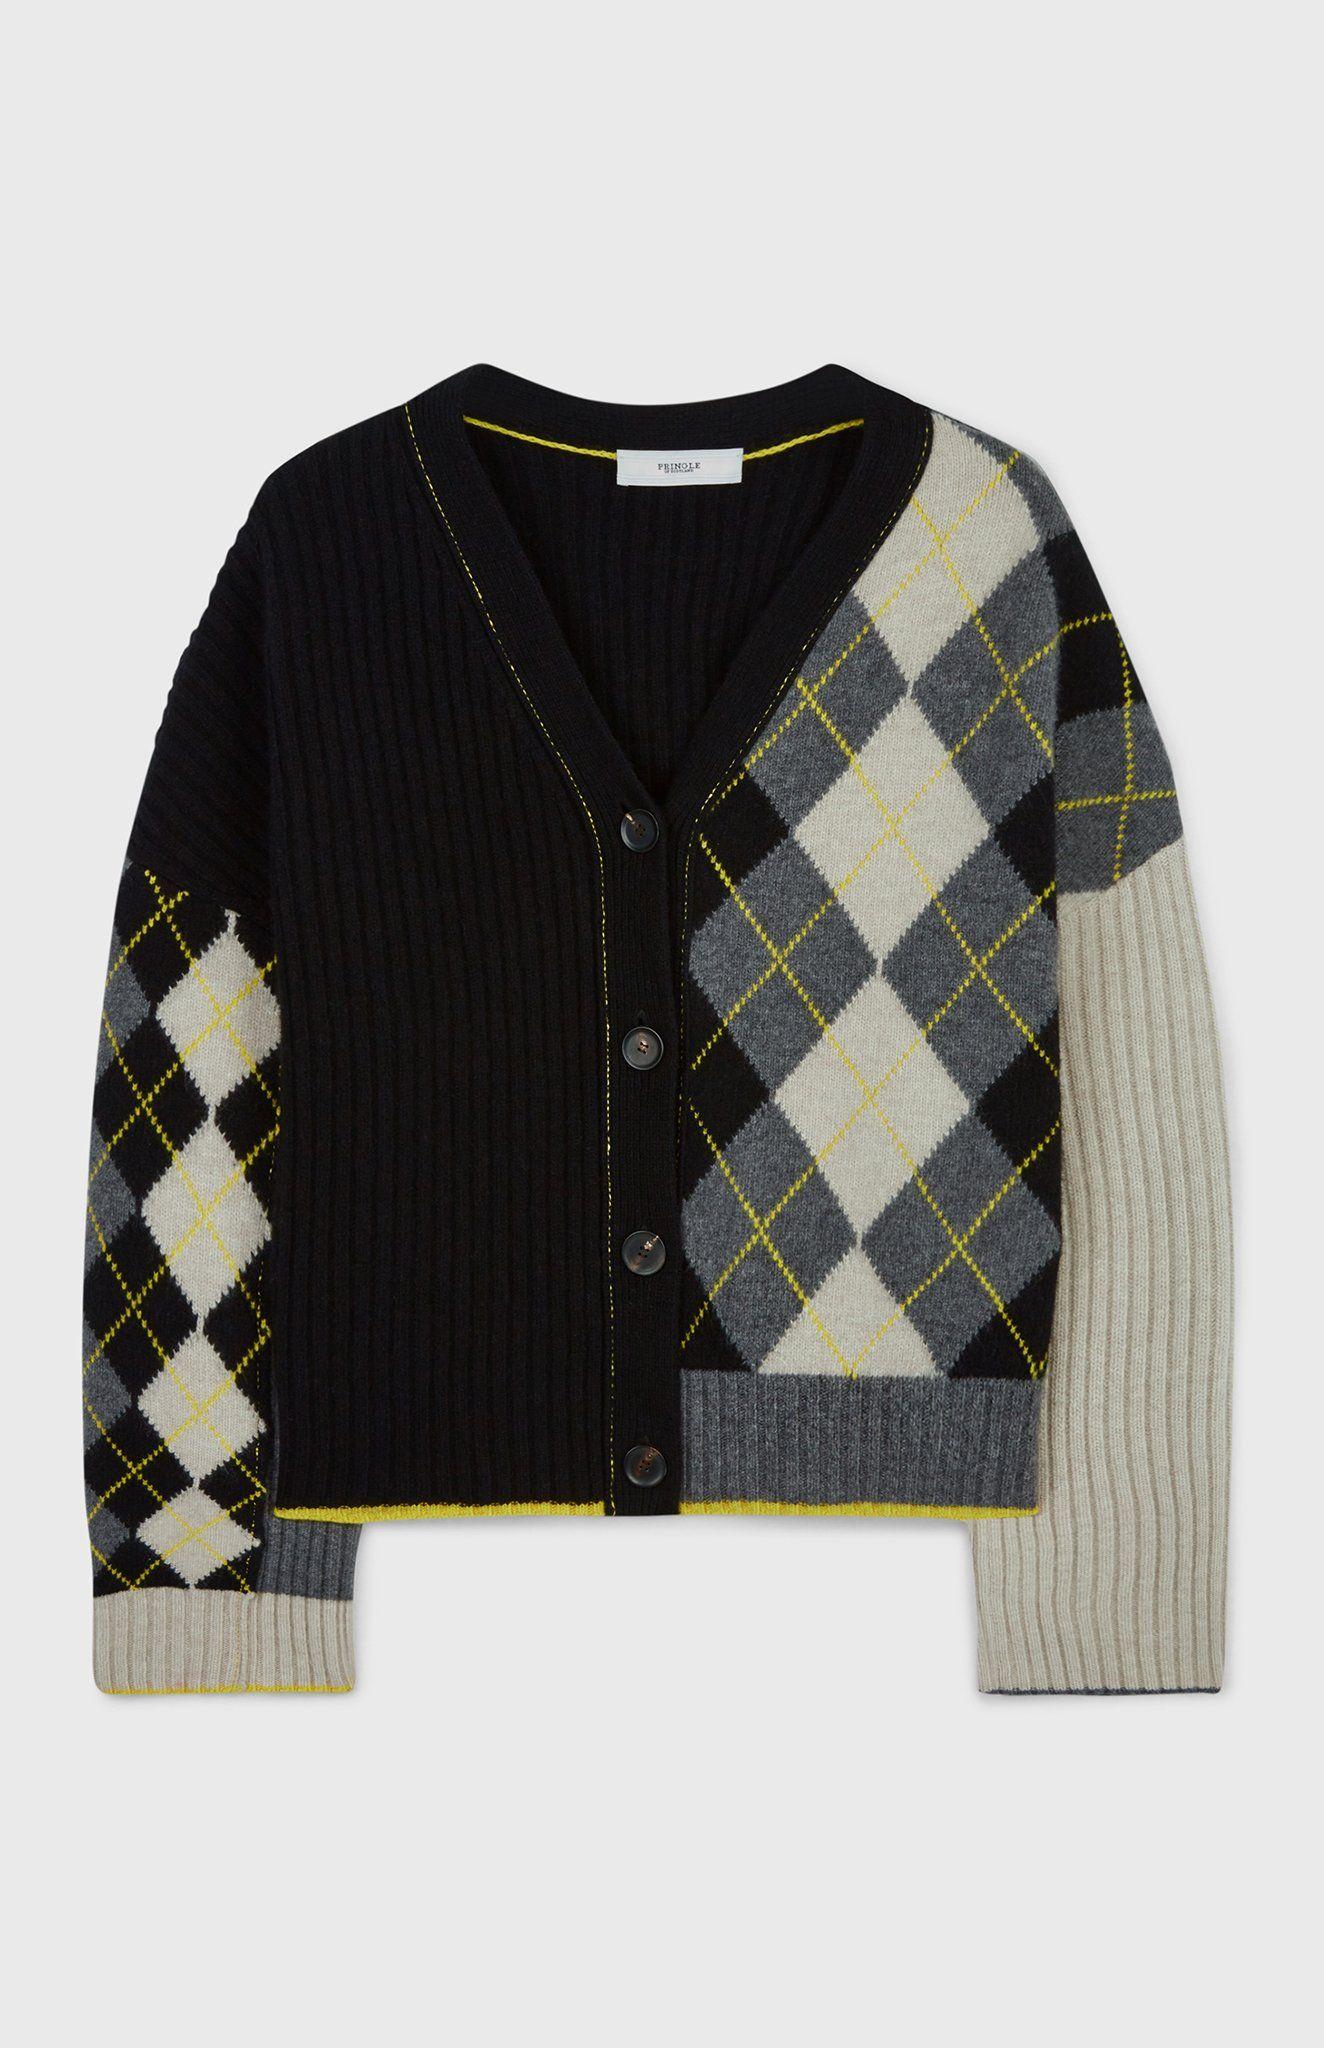 Knitwear Patchwork Solid Argyle Cardigan Neck amp; Jacquards V qvPqw4Y